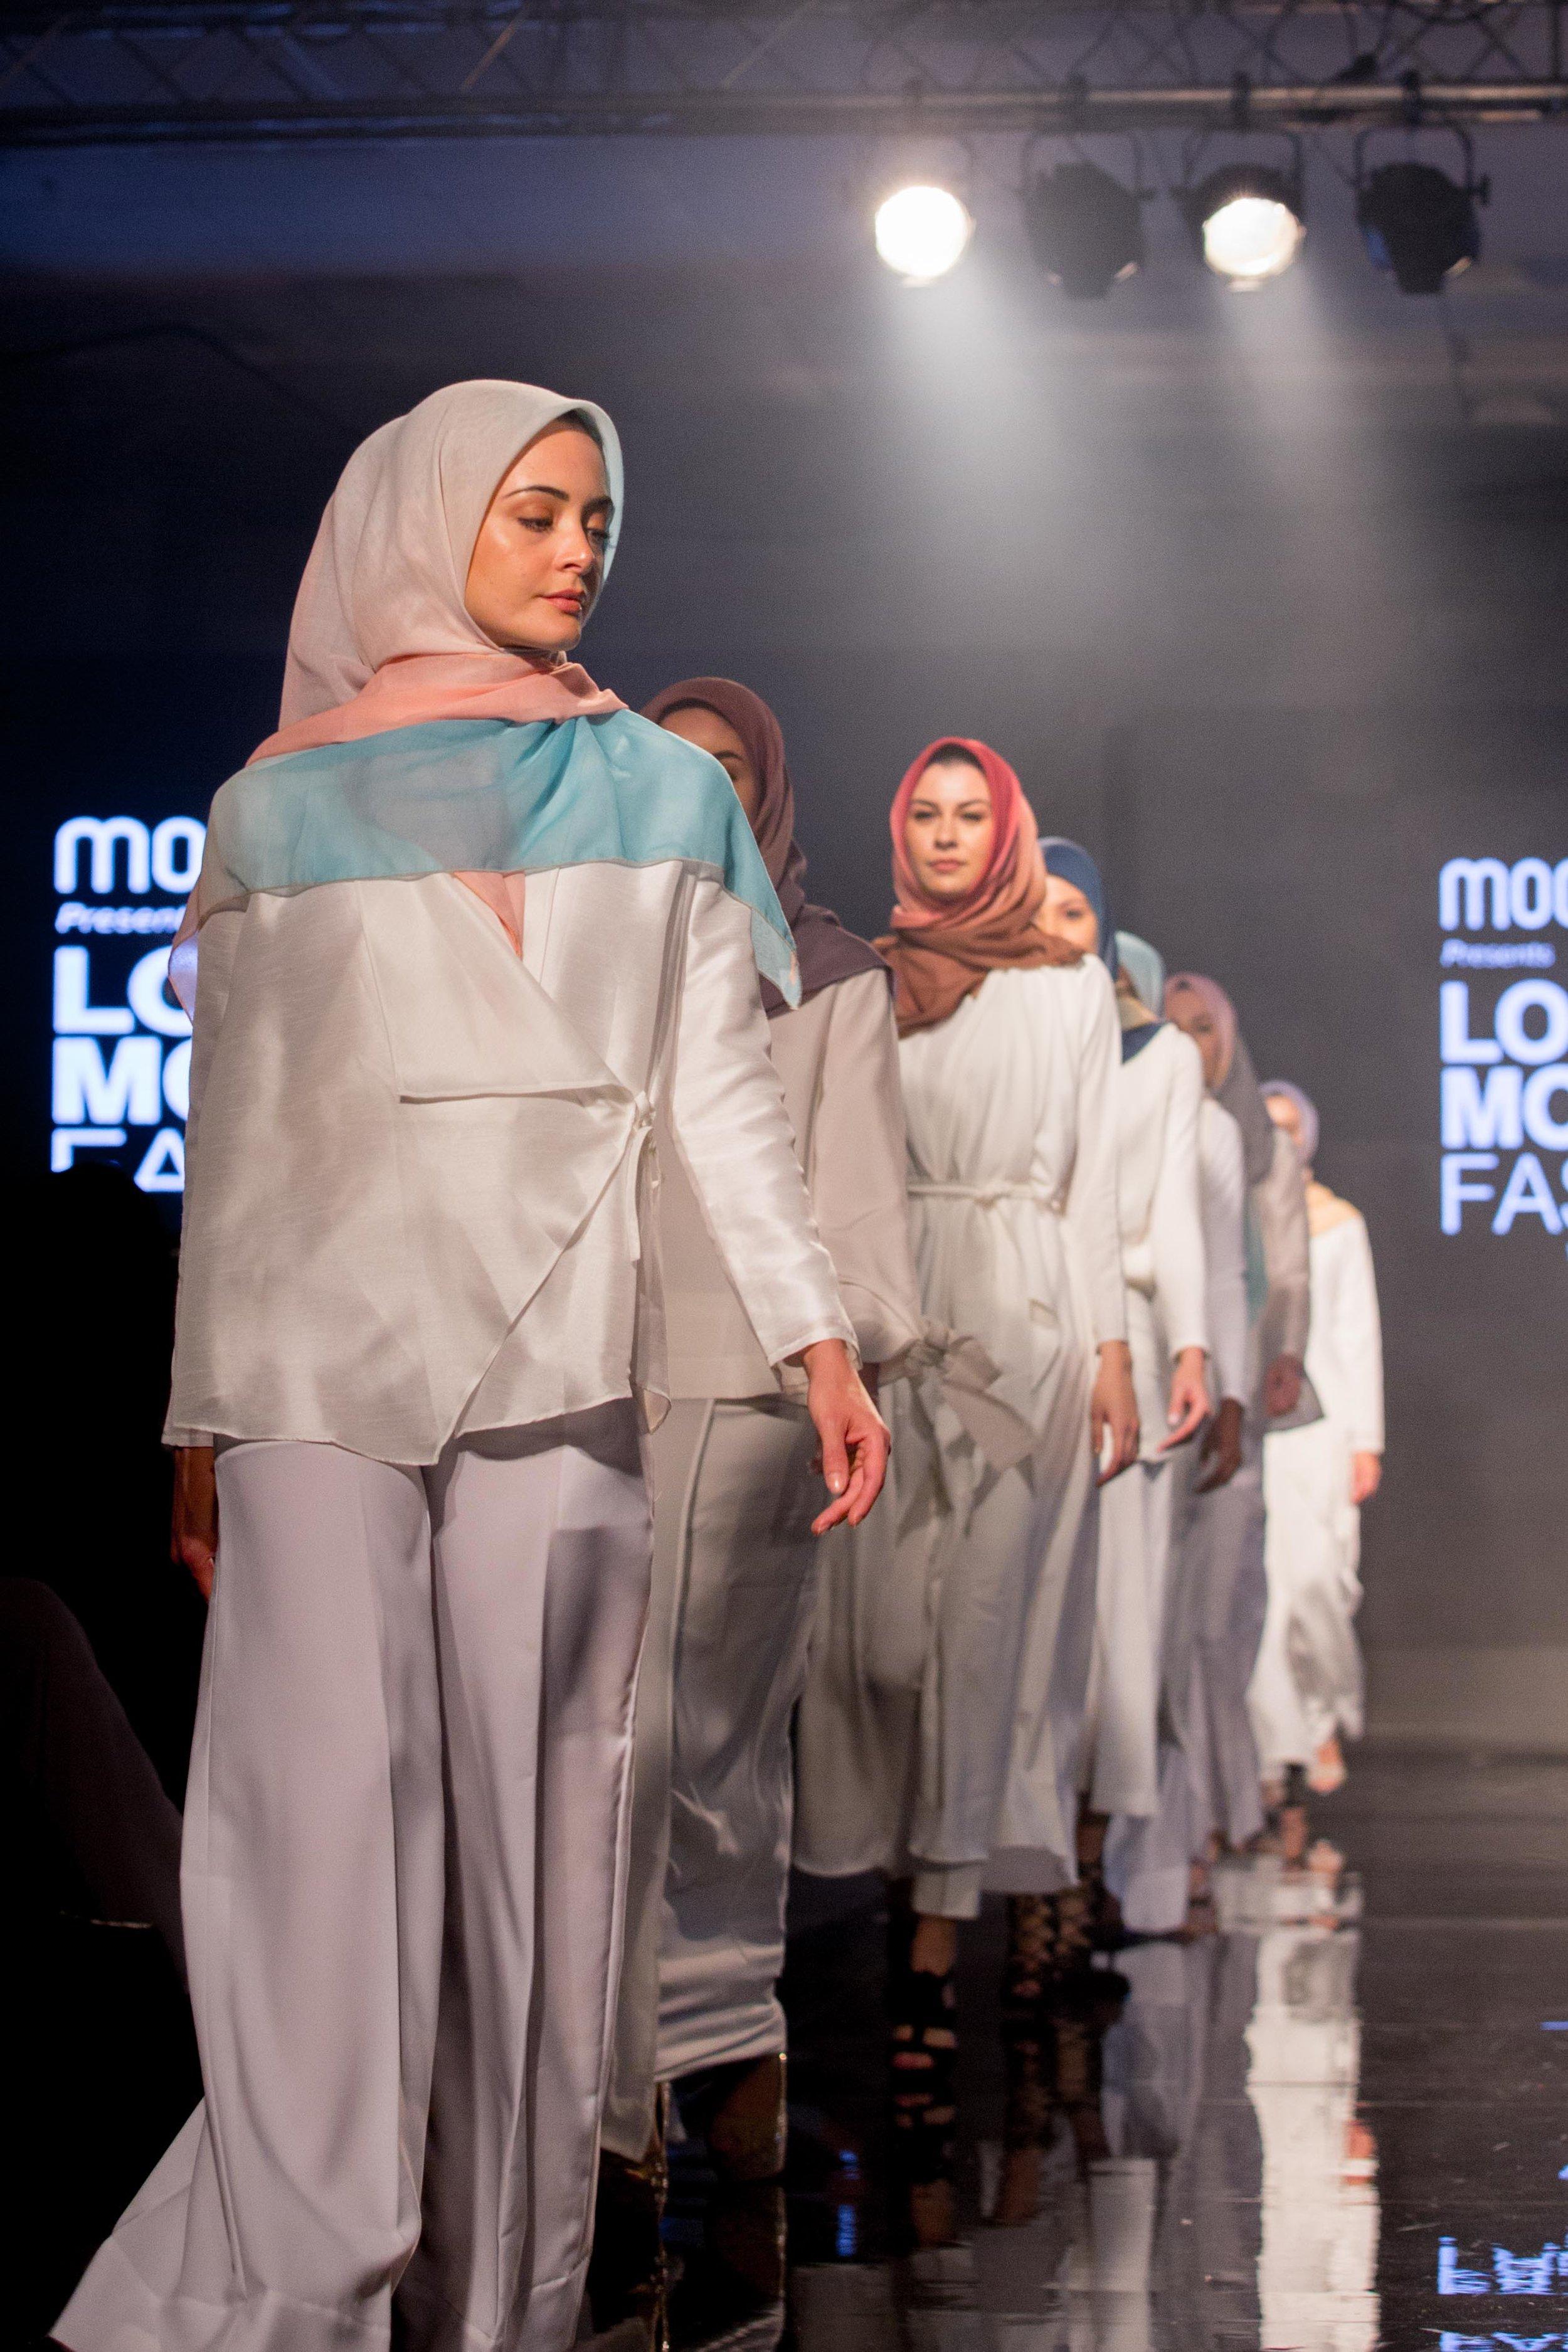 Aidijuma-London-Modest-Fashion-Week-catwalk-photographer-natalia-smith-photography-2.jpg